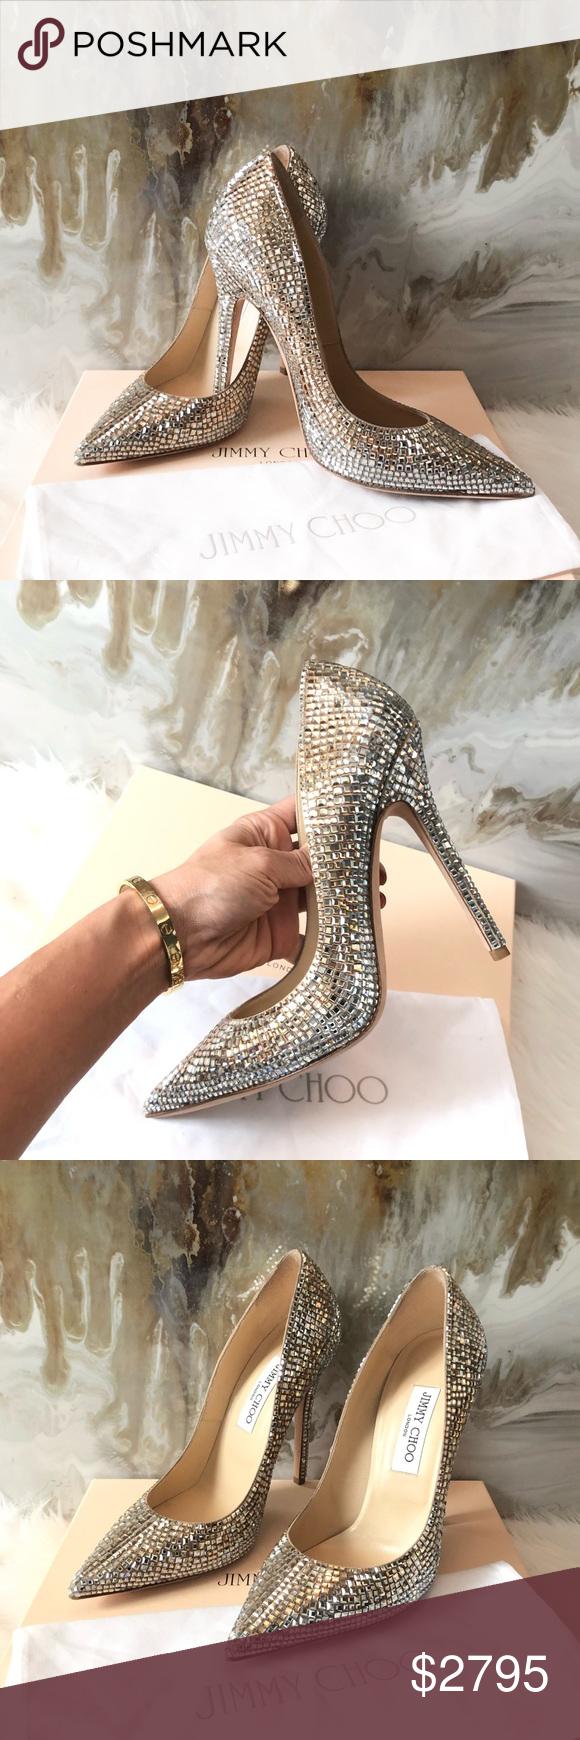 Jimmy Choo Ombre Tartini Swarovski Crystal Heels Pumps Size